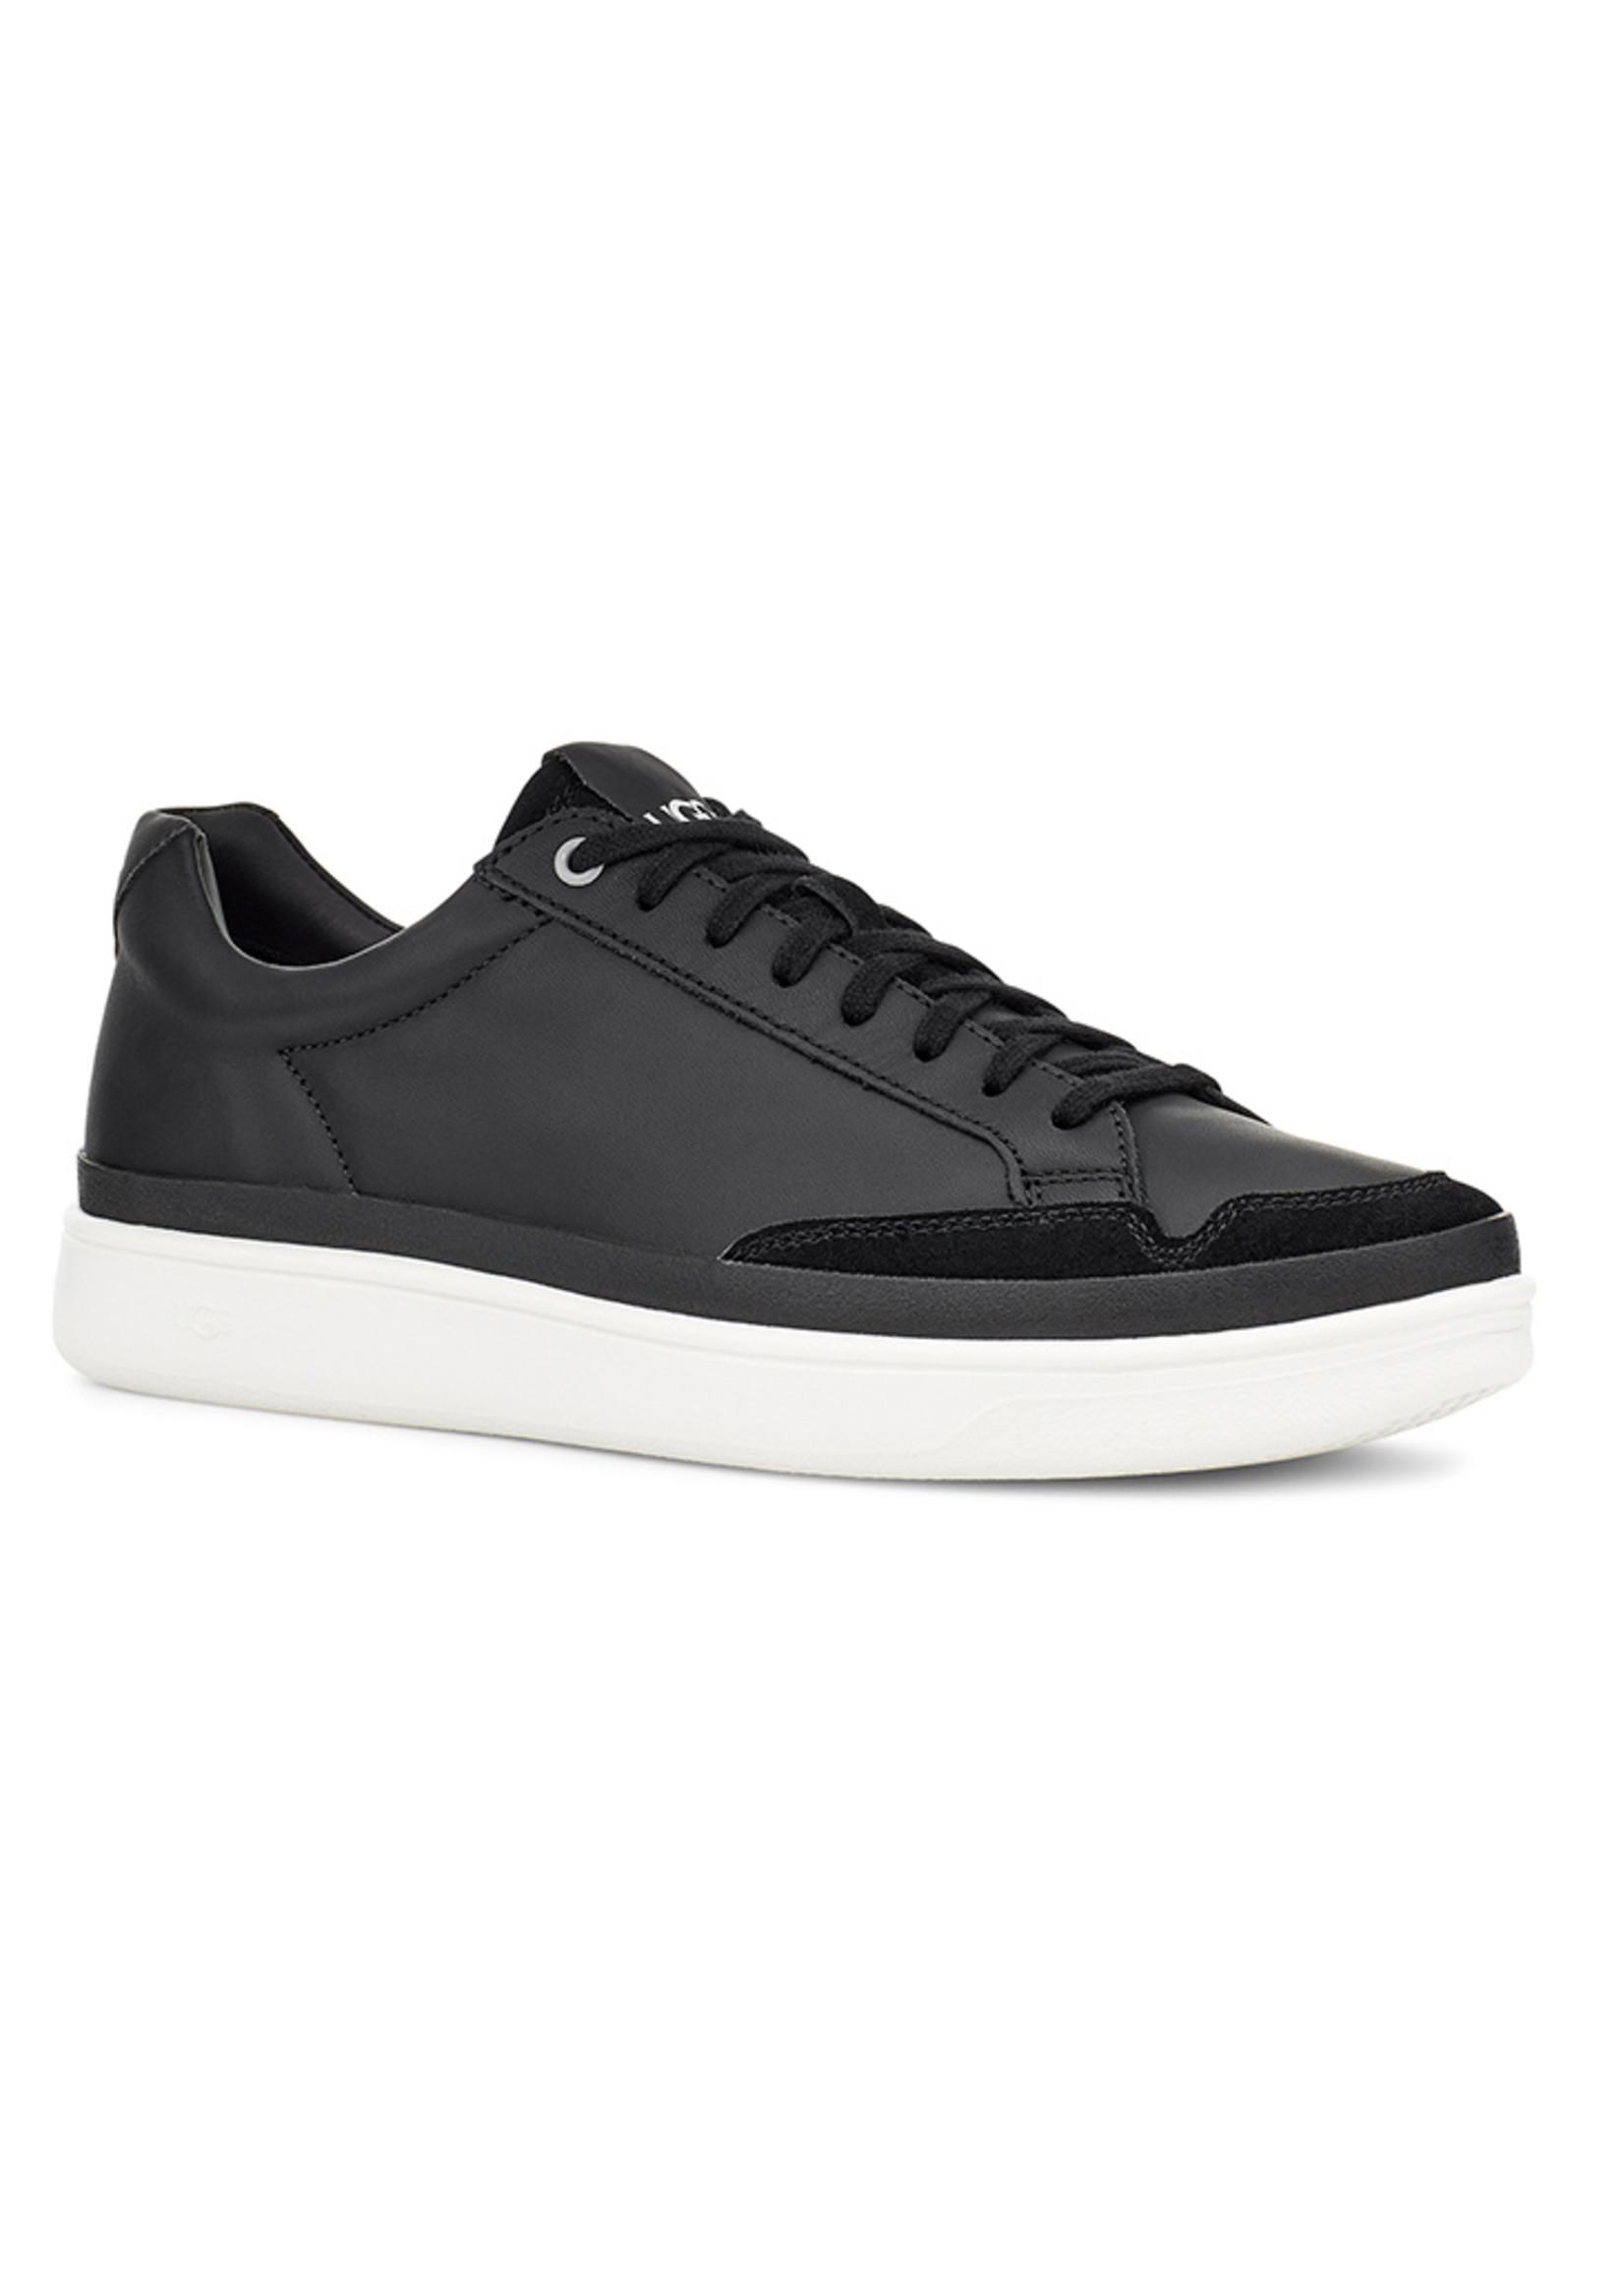 UGG UGG / Men's South Bay Sneaker Low